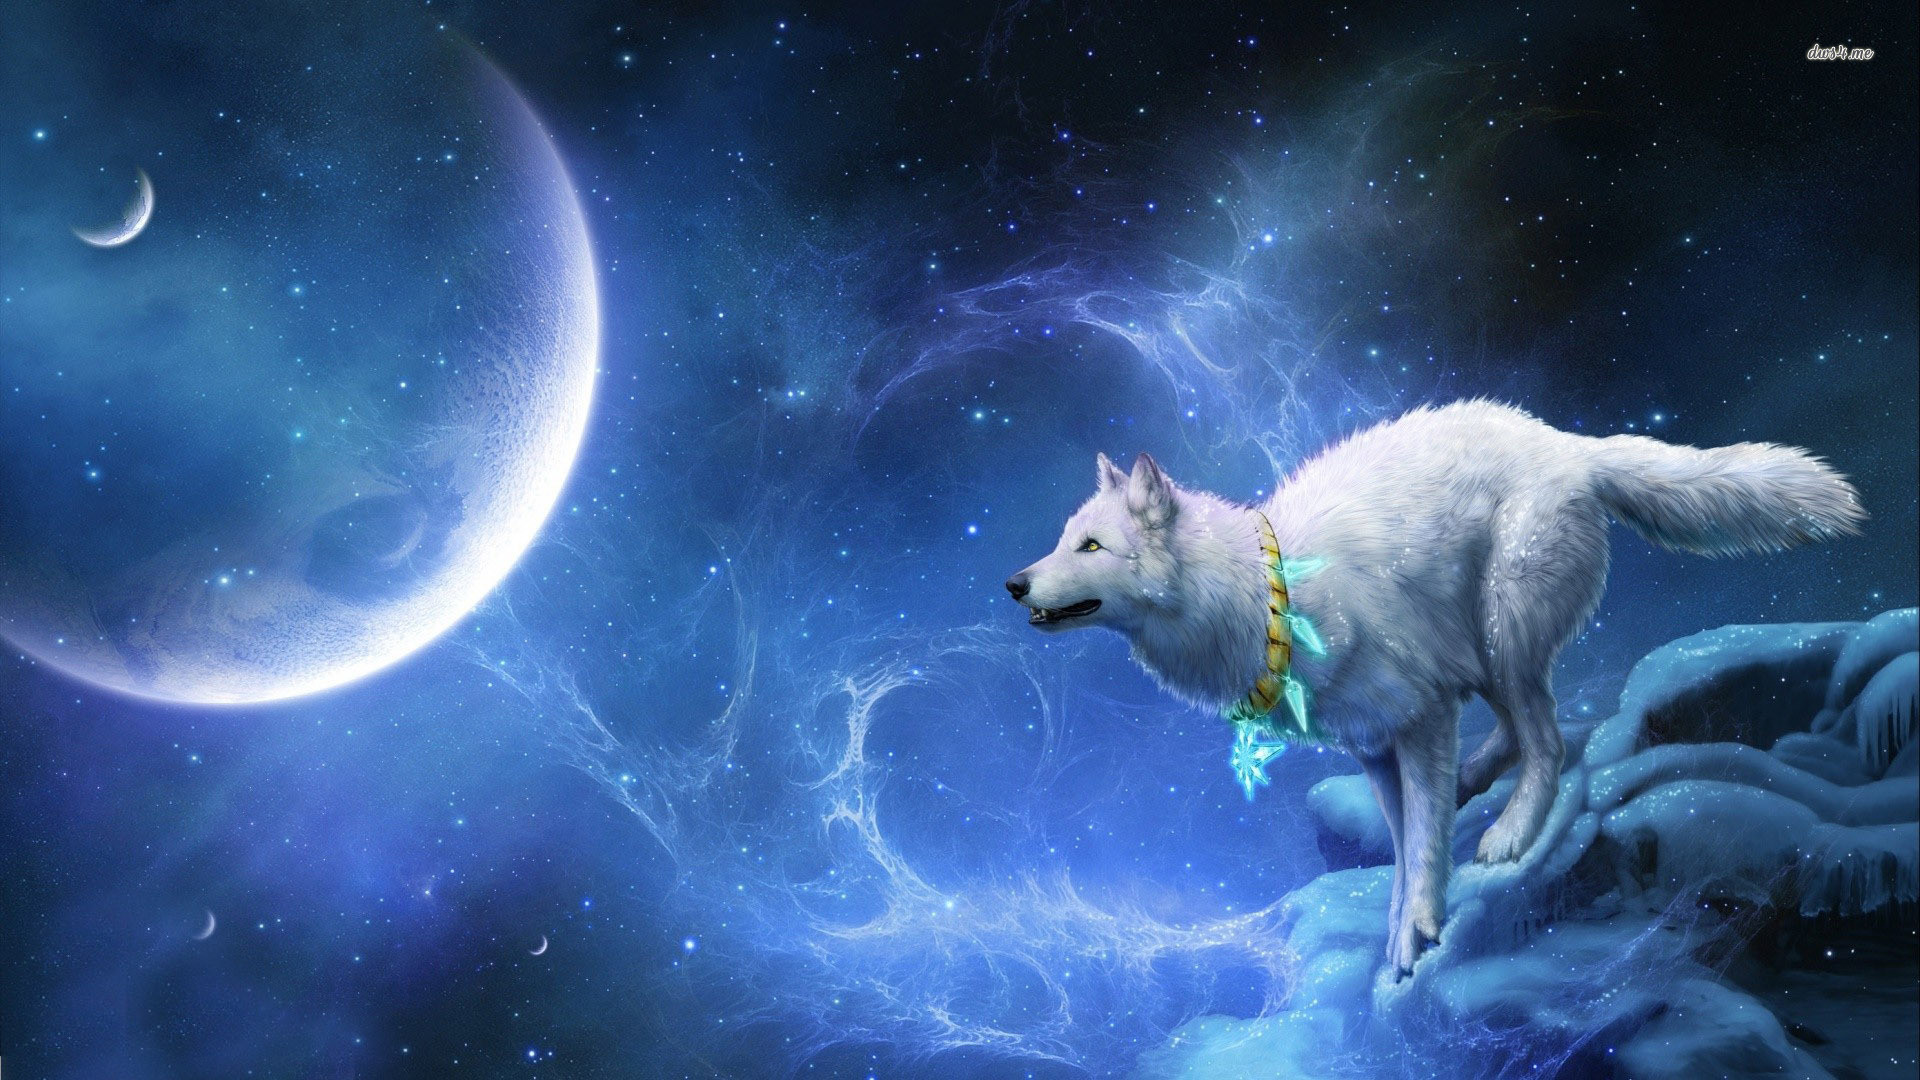 Image – 13825-wolf-in-space-1920×1080-digital-art-wallpaper.jpg | Animal Jam  Clans Wiki | FANDOM powered by Wikia